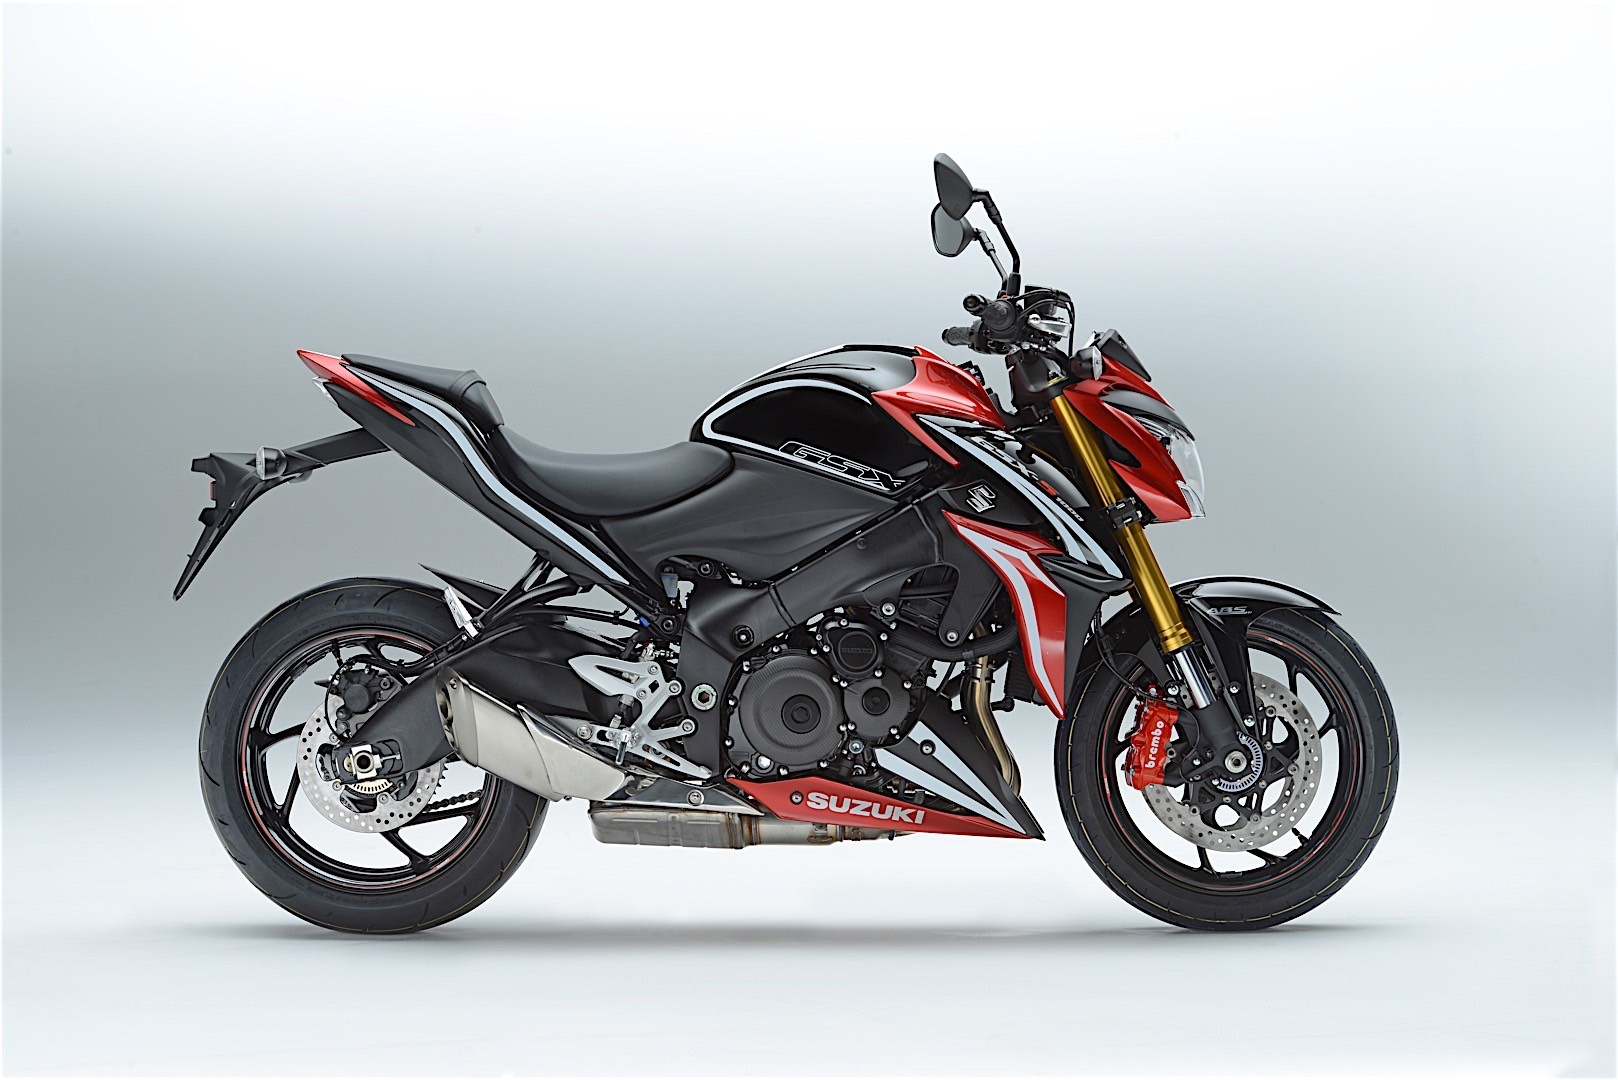 Suzuki Reveals Special Editions GSX-S1000 And GSX-S1000F